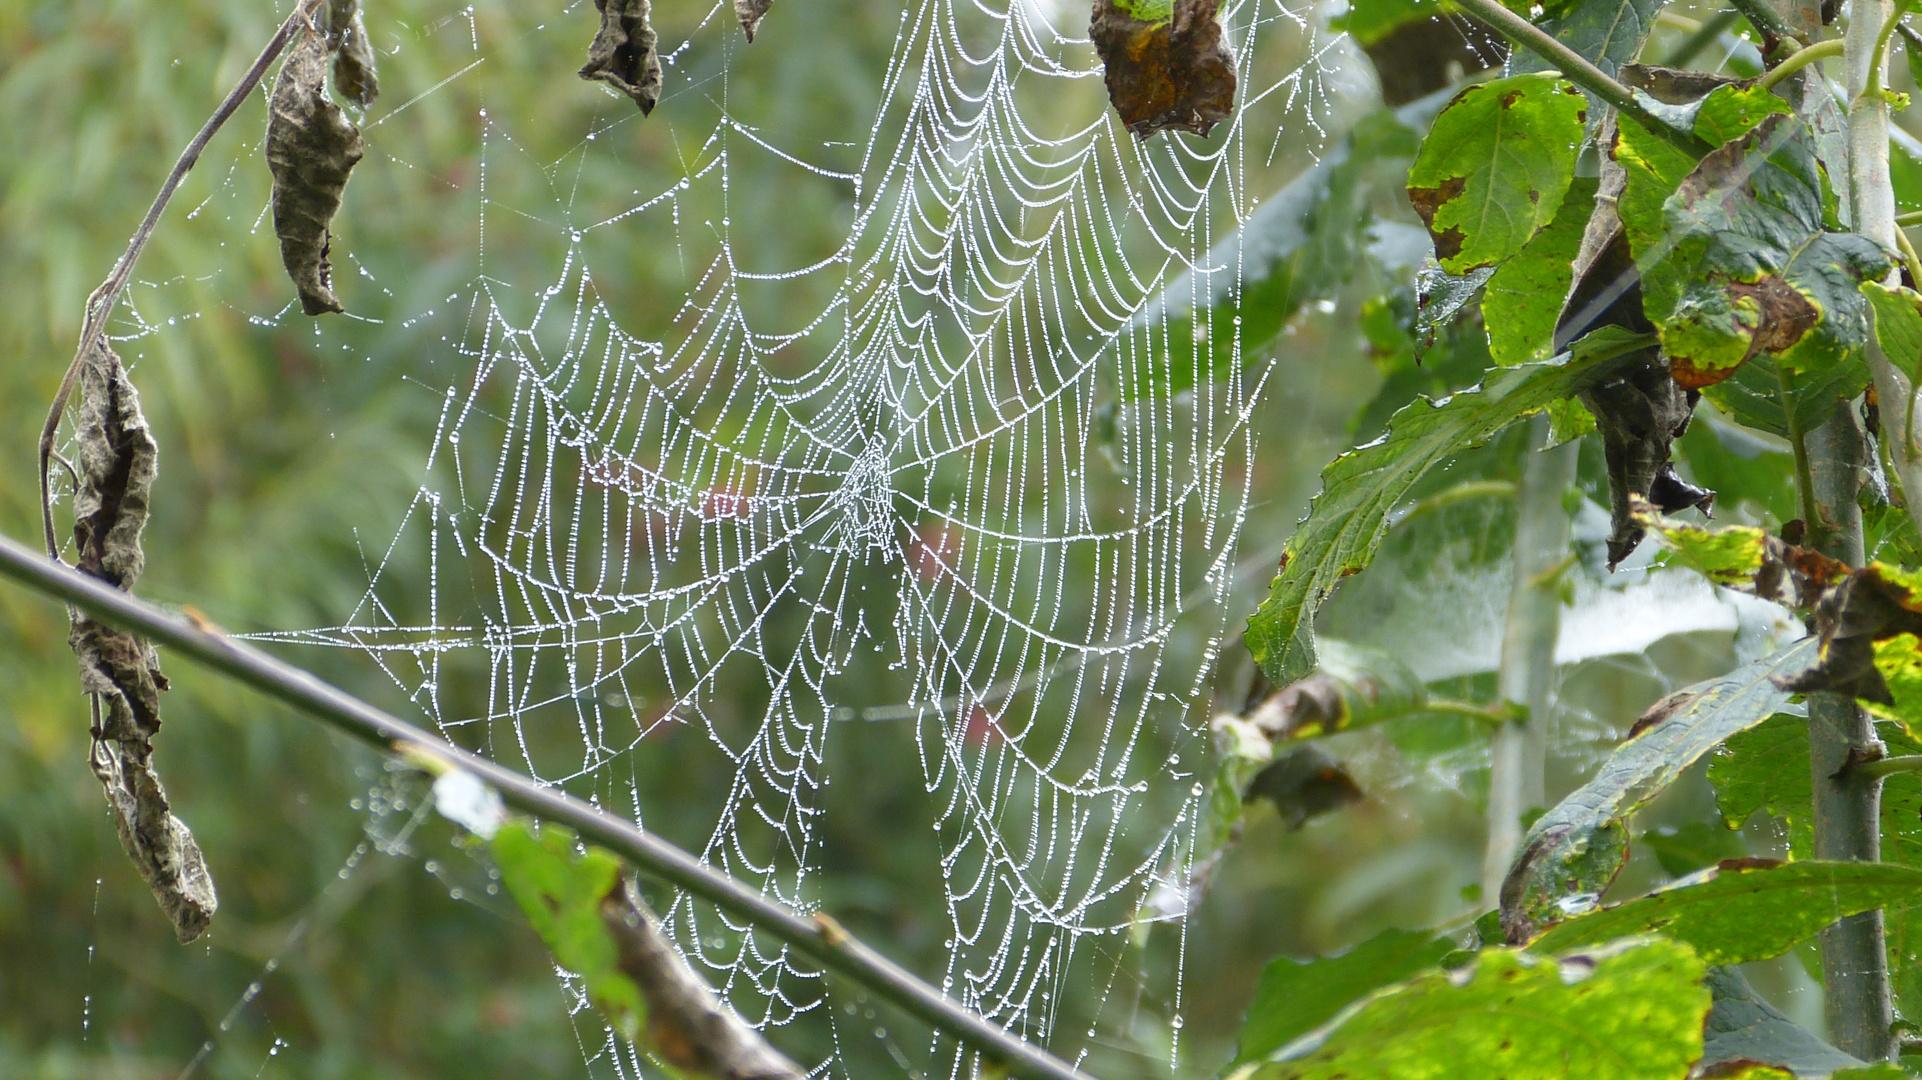 Spinnennetz 2